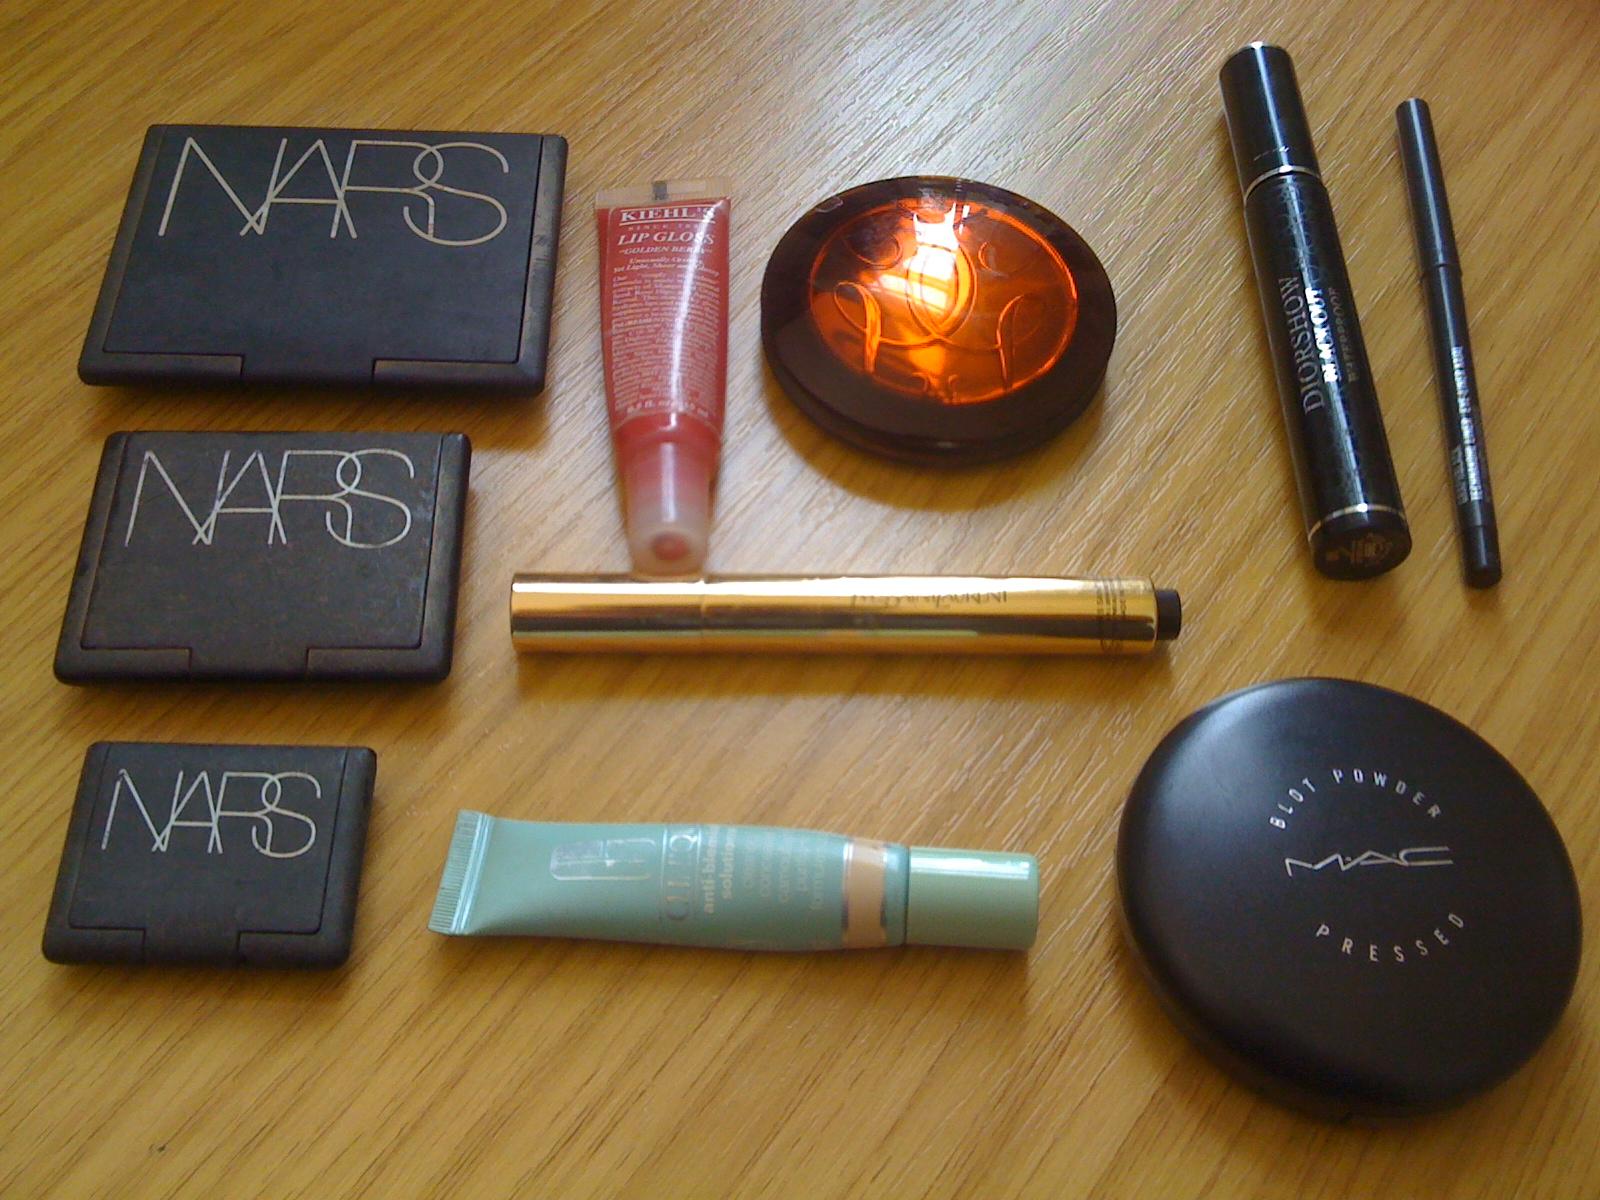 http://4.bp.blogspot.com/_KBhDQ30WhFo/TKsRnLjJlBI/AAAAAAAAAgw/GYaFiAh6V9E/s1600/make+up+bag.jpg